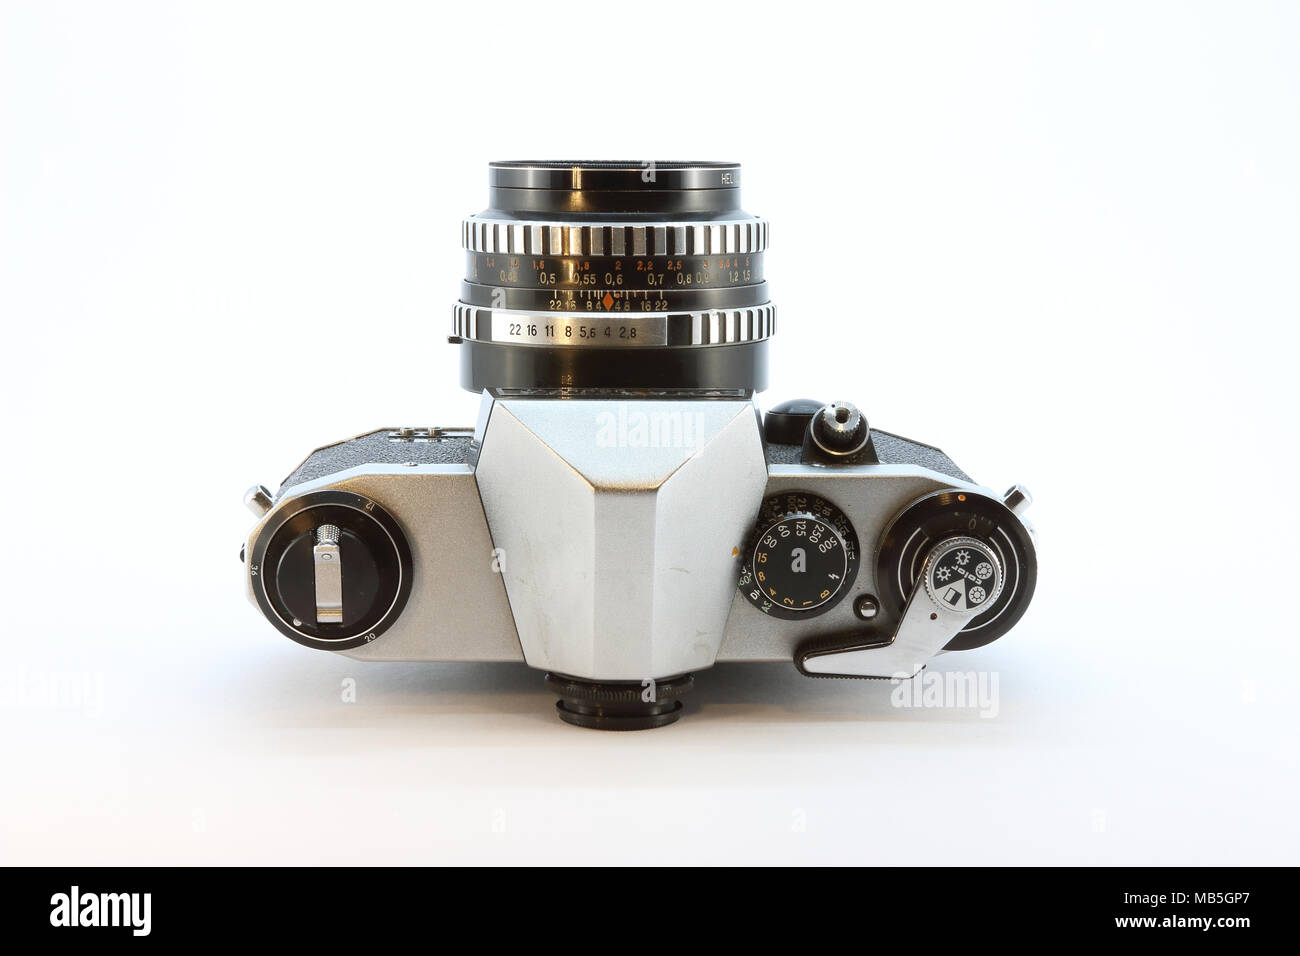 Praktica film camera on white background - Stock Image